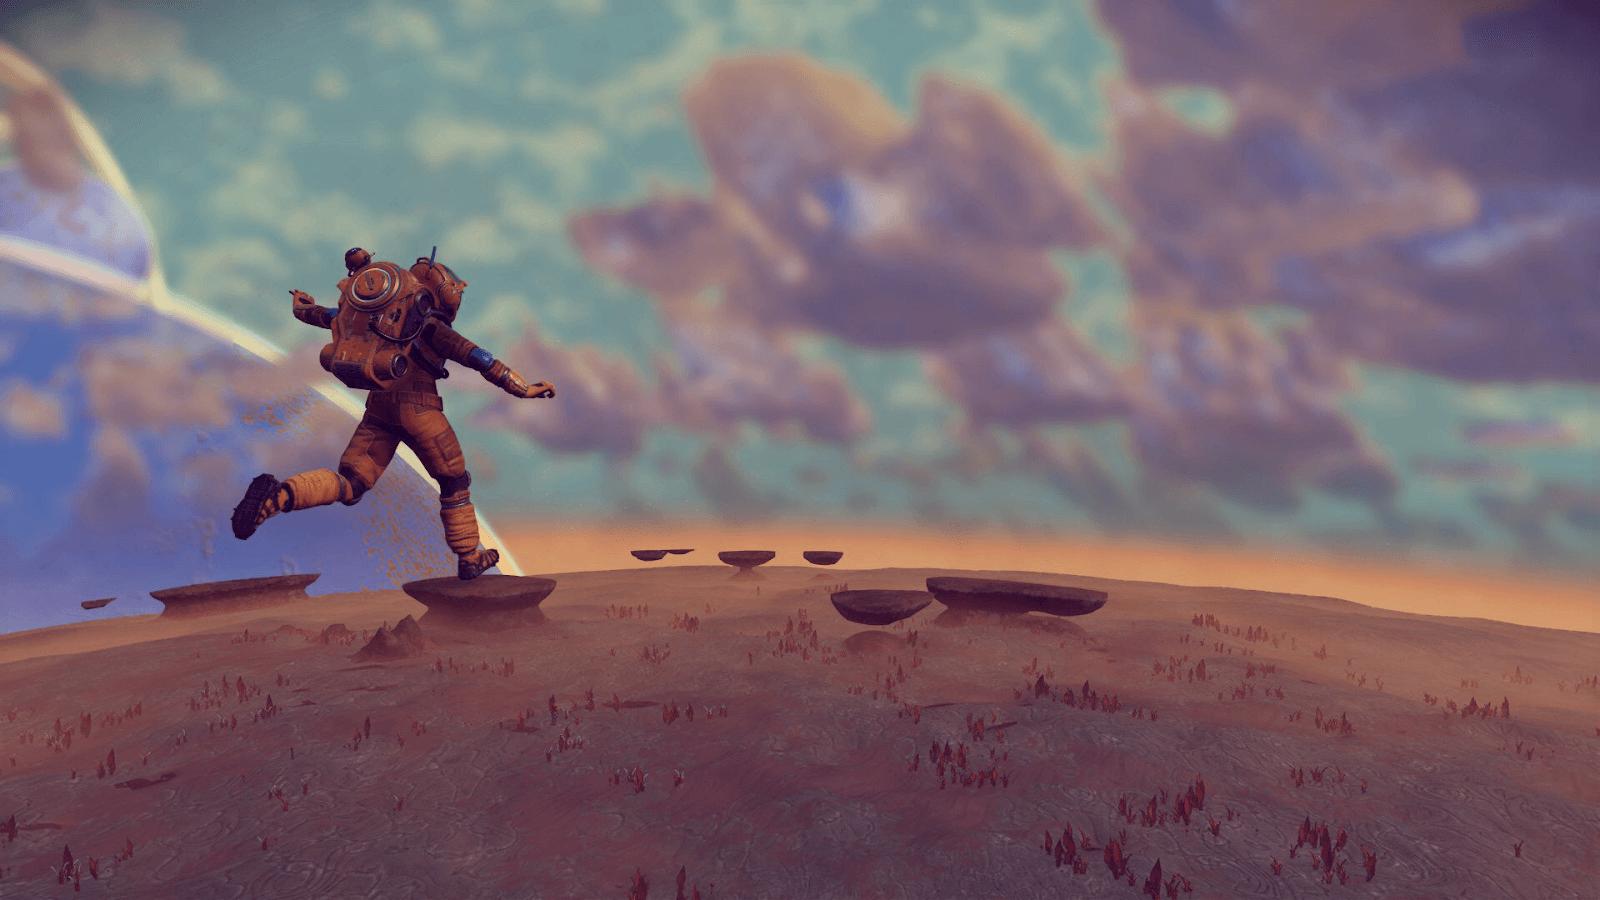 Development Update - 1 59 - No Man's Sky